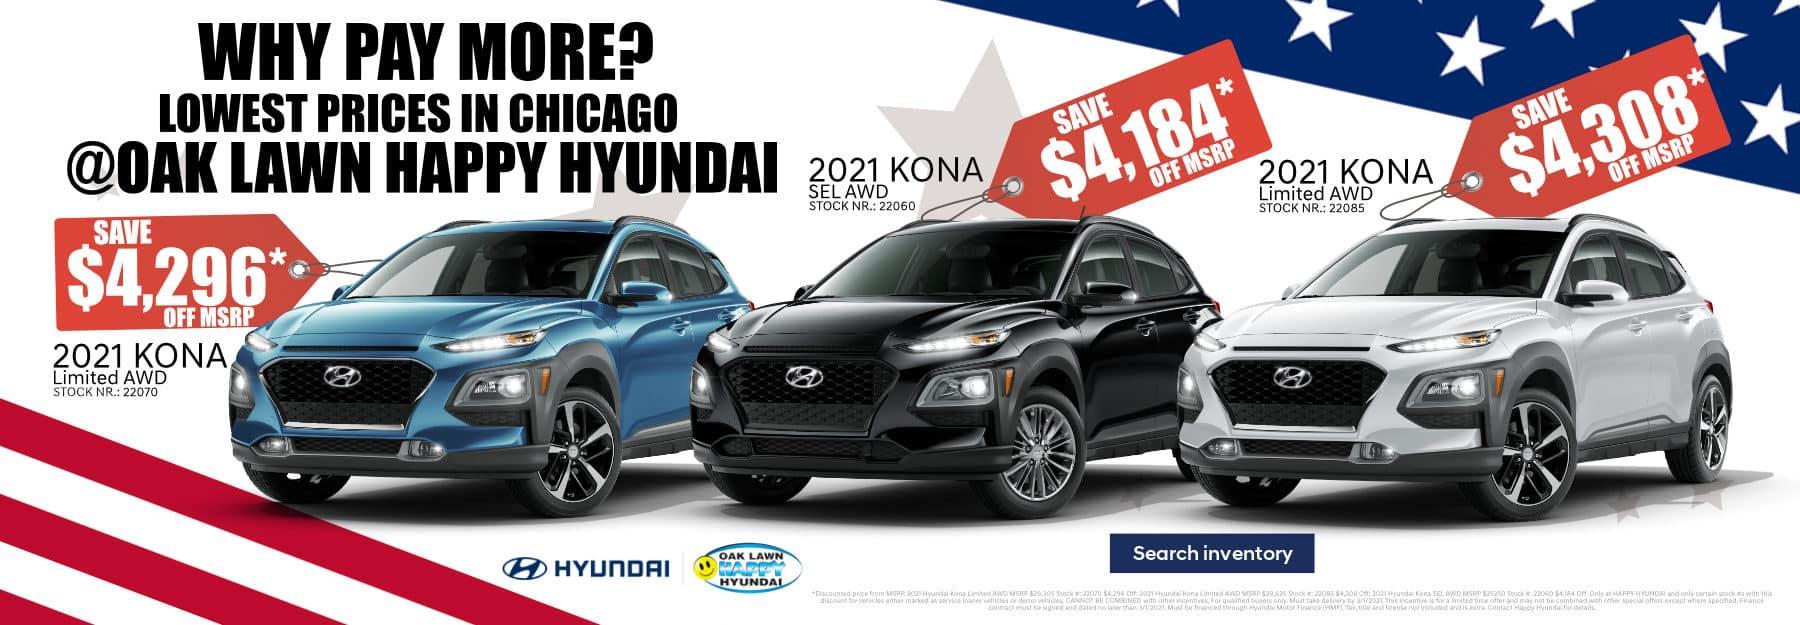 R_February_2021_Kon Triple Offer_Happy Hyundai